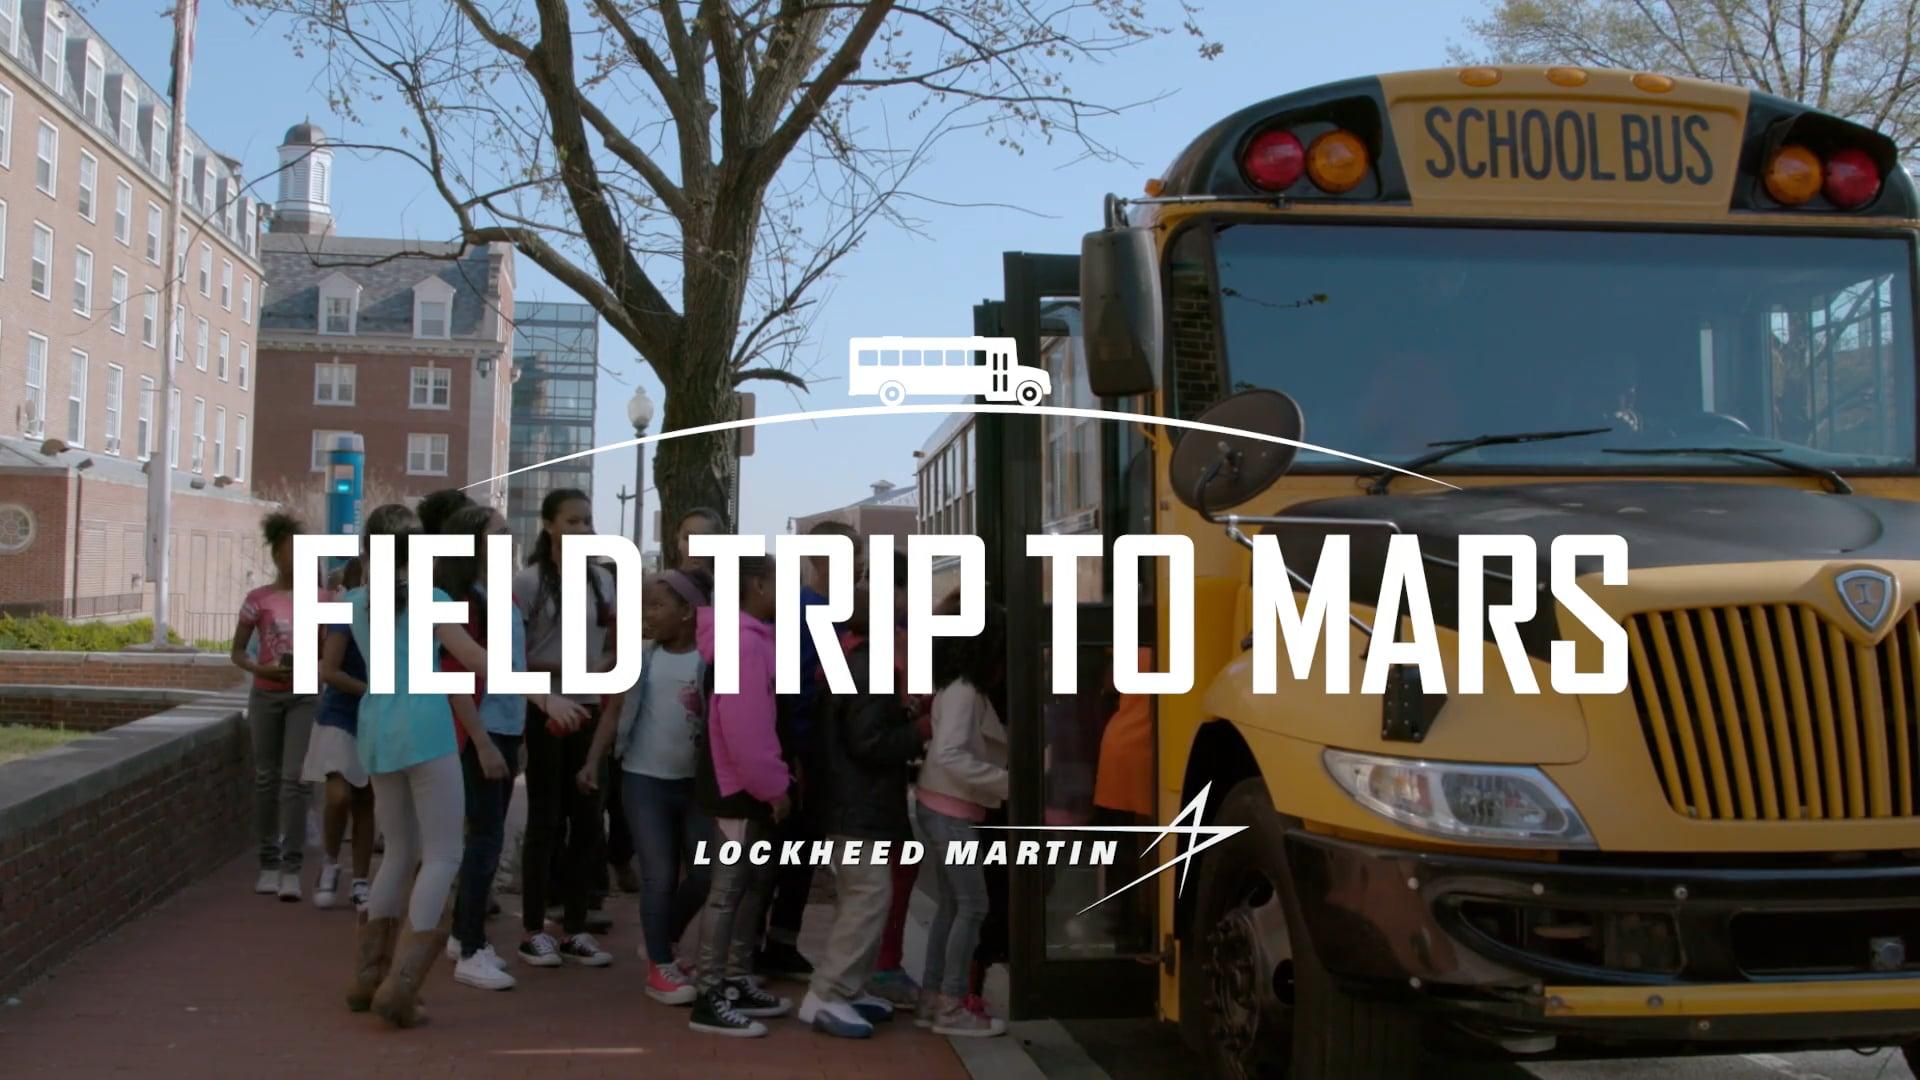 Field Trip to Mars-schoolbus